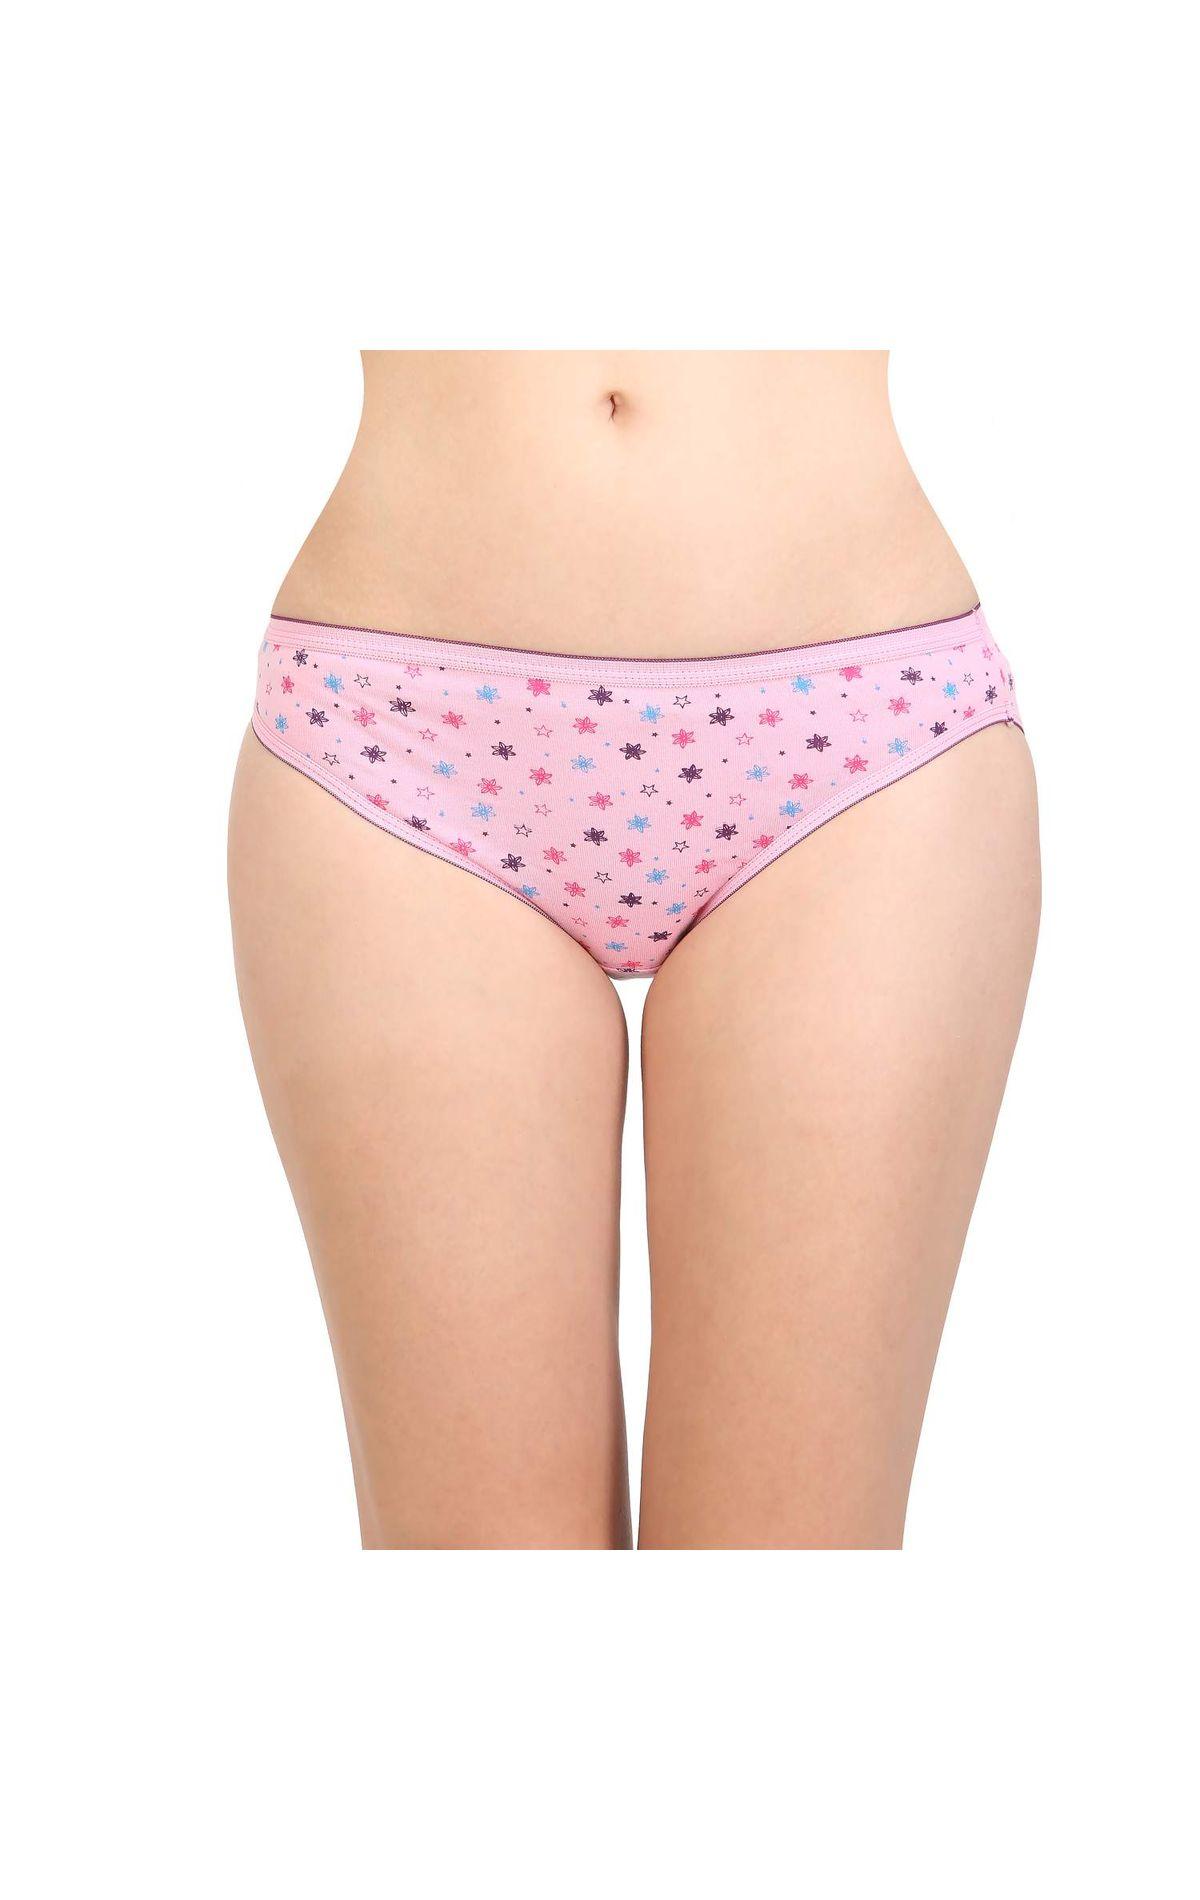 Bodycare 100 Cotton Printed High Cut Panty